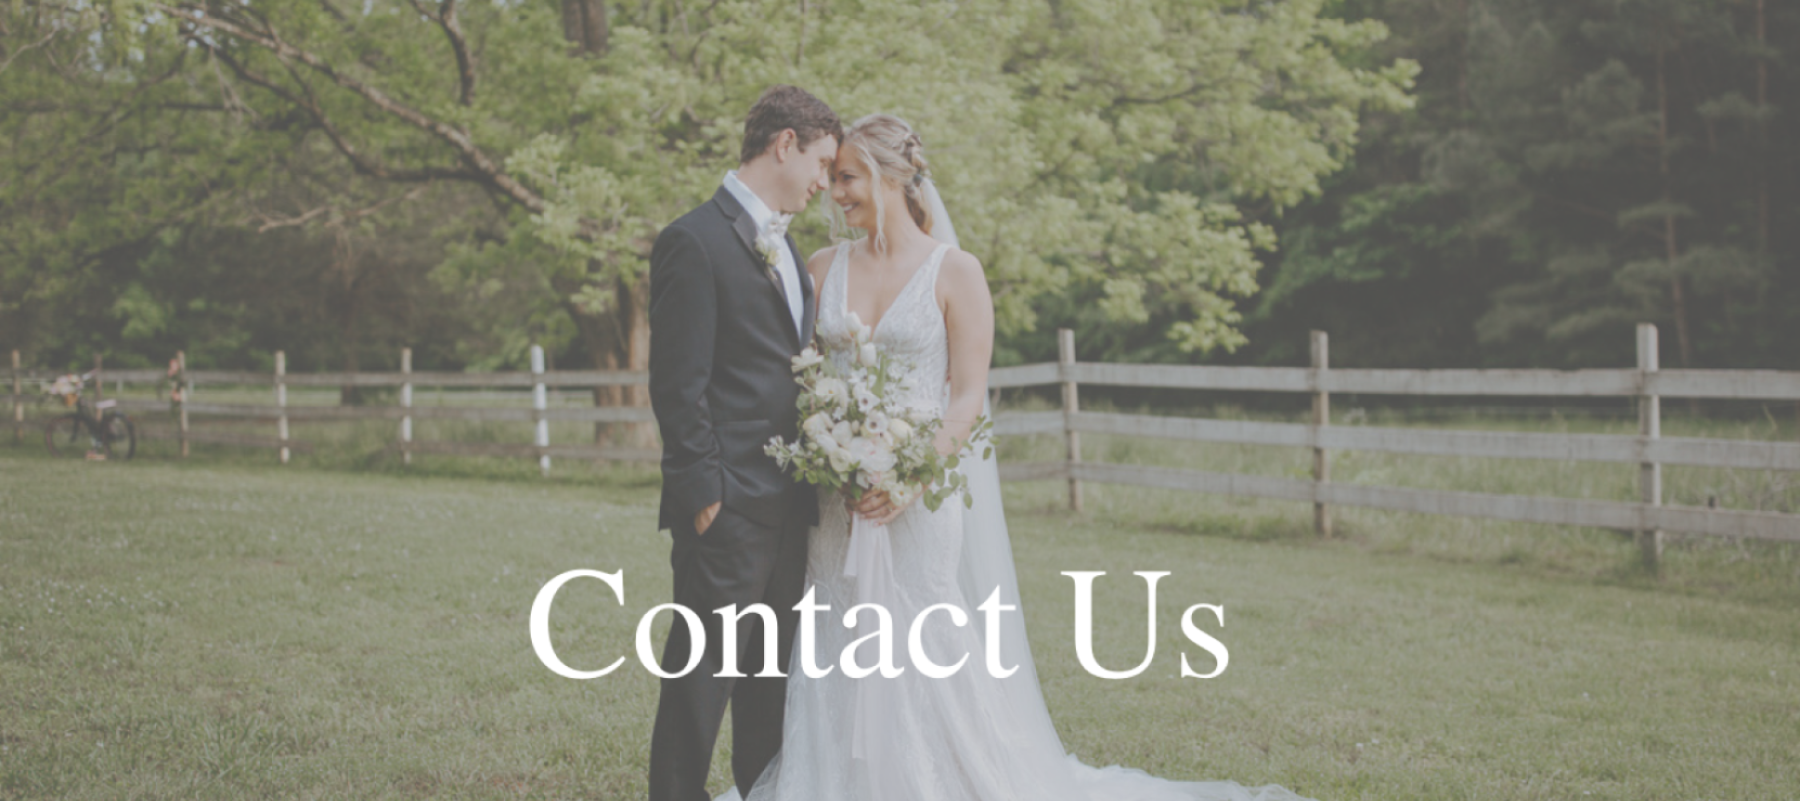 Contact | Simon's Formal Wear Augusta, GA| Suits - Tuxedos - Men's Formal Wear